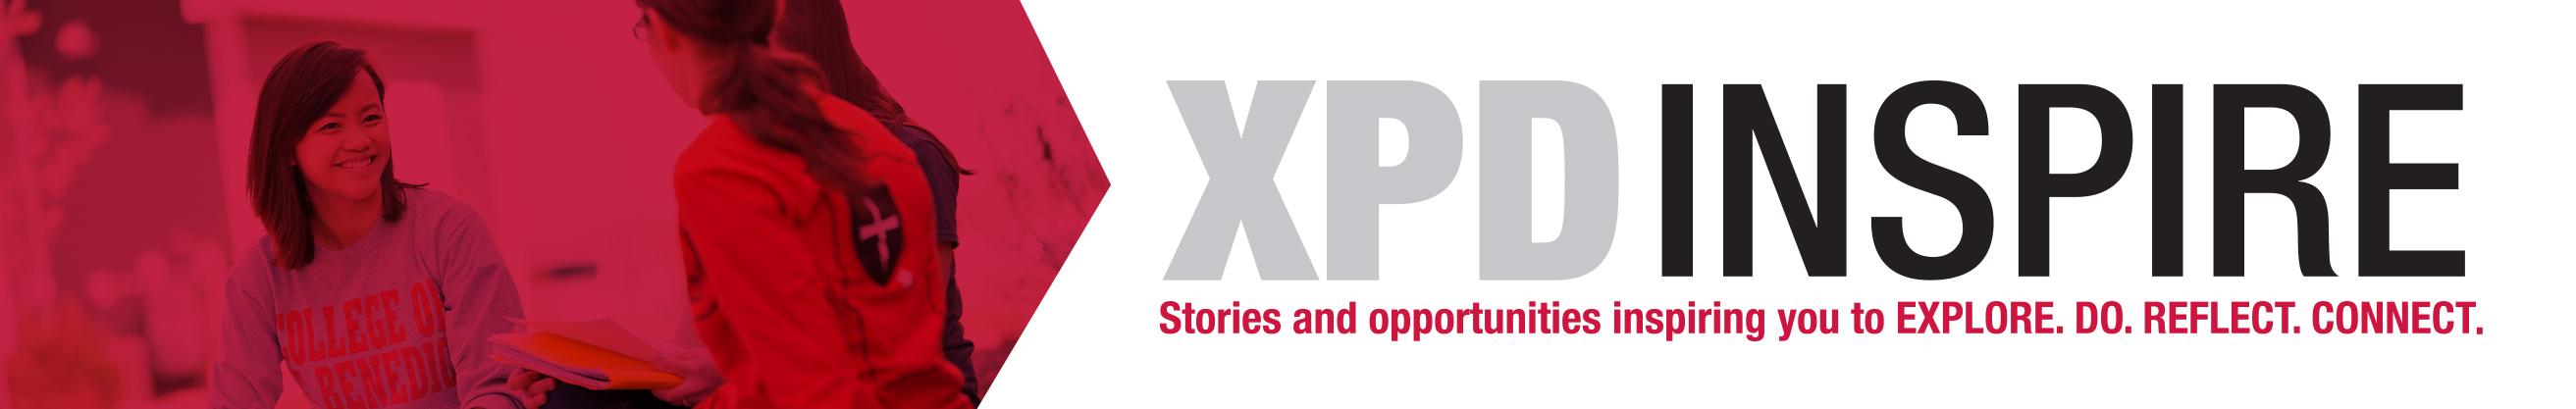 XPD Inspire Header 5 (002) 2